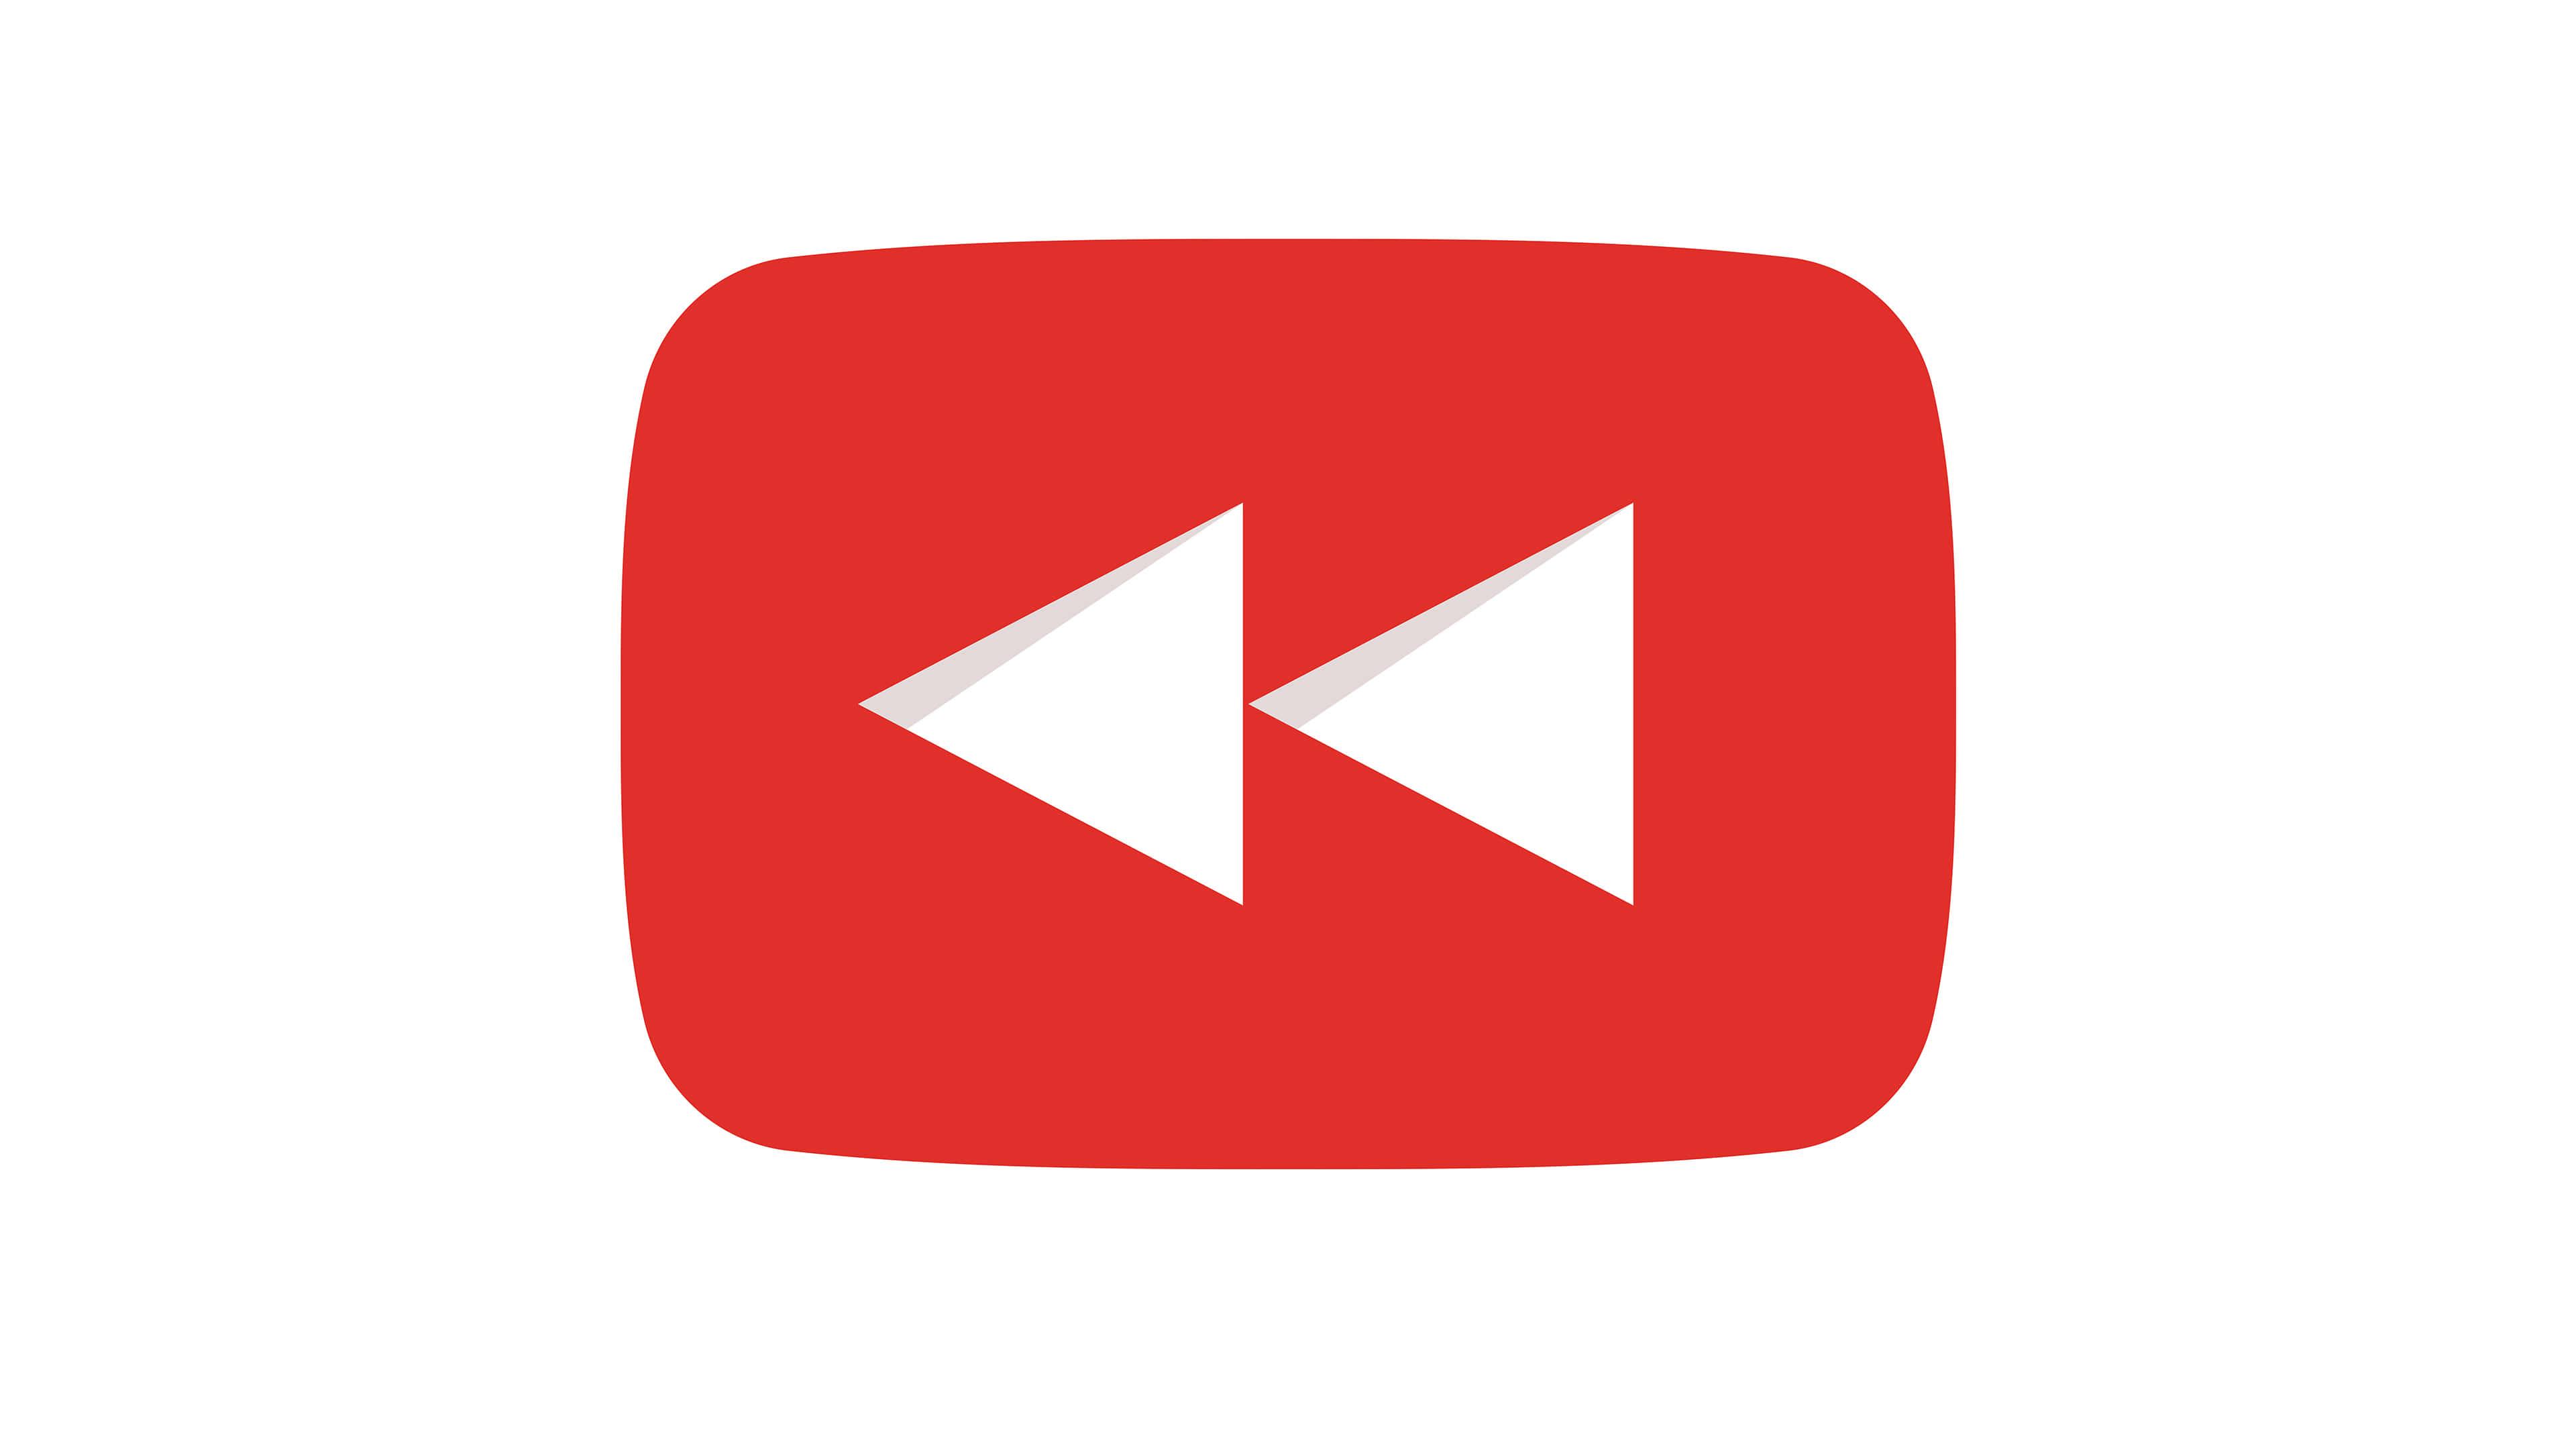 youtube rewind logo uhd 4k wallpaper